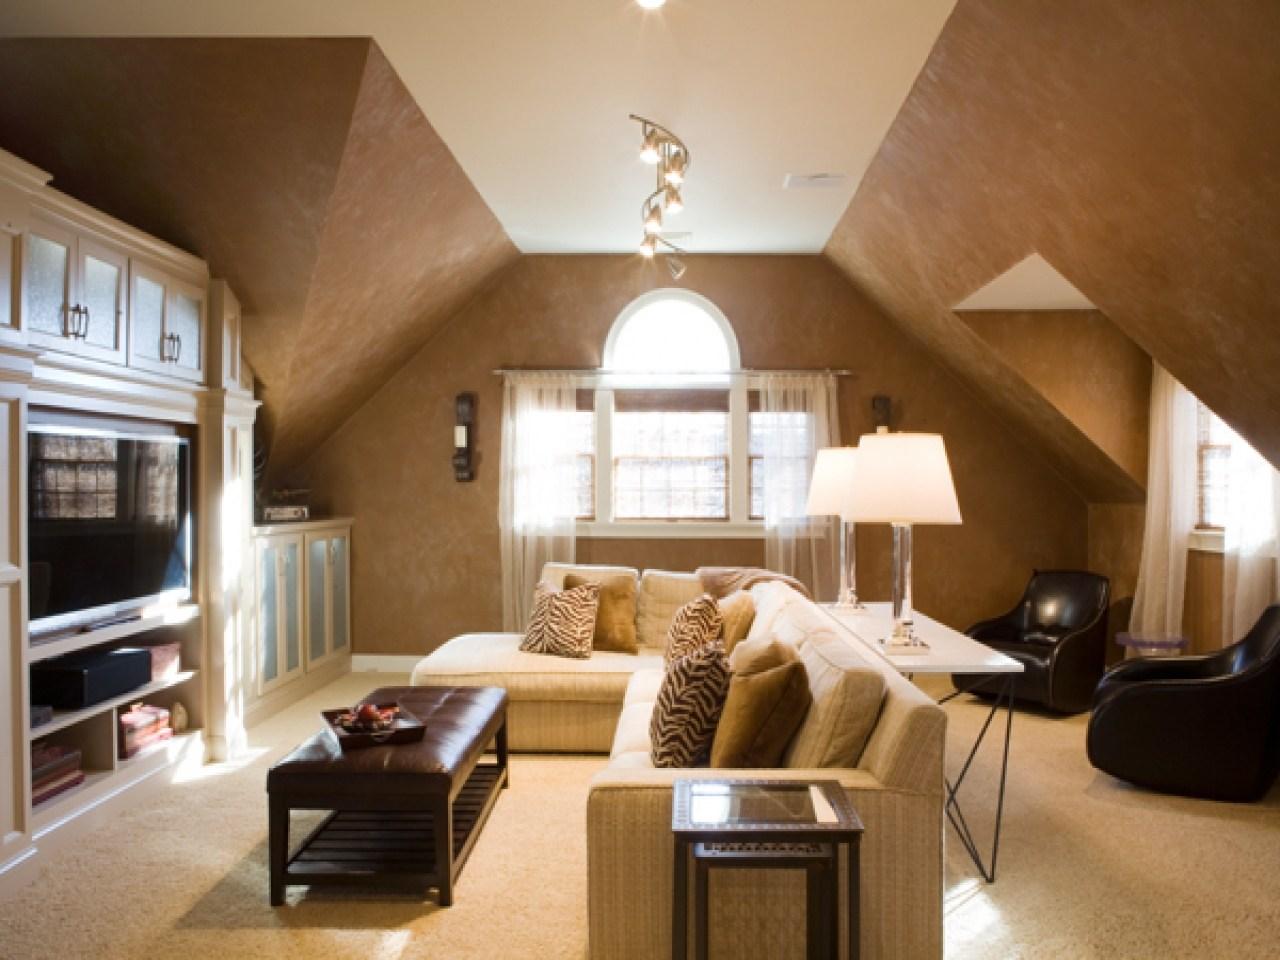 Дизайн чердака с низким потолком фото